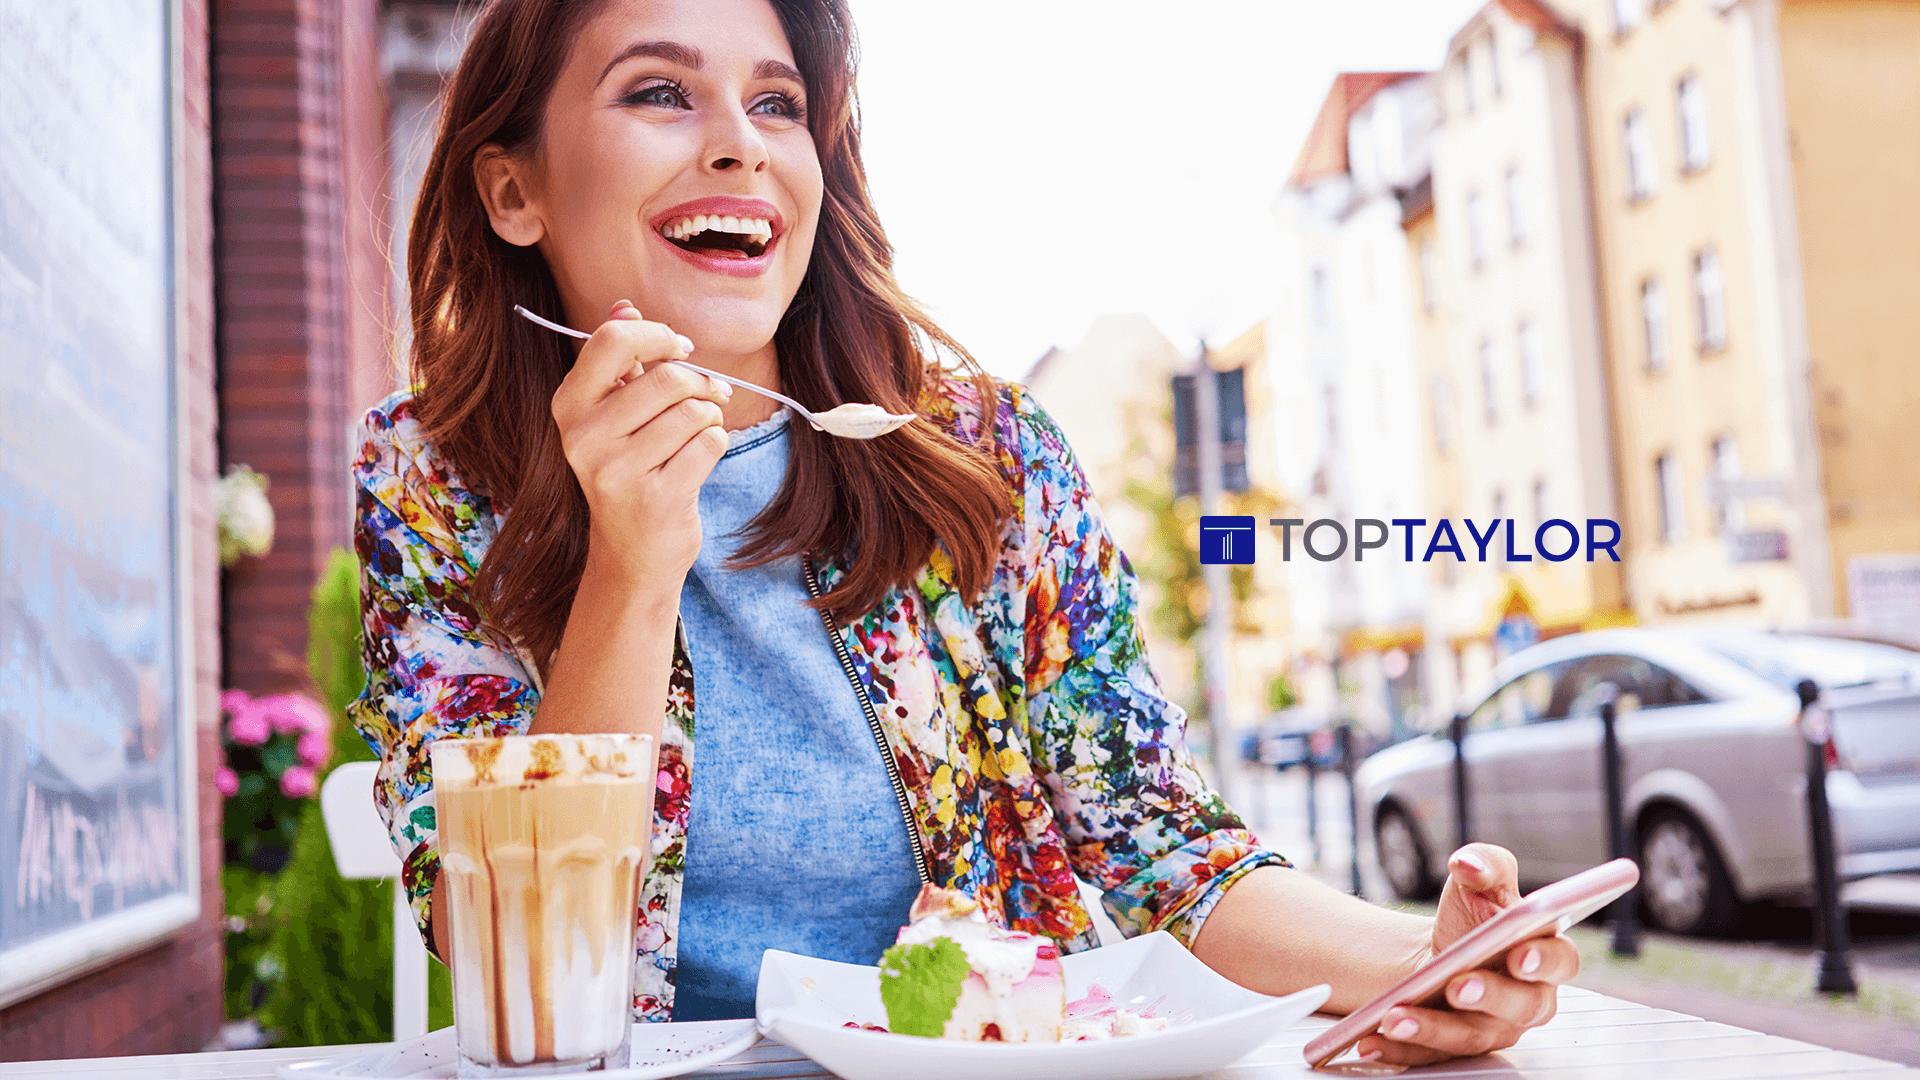 Mulher feliz tomando sorvete.